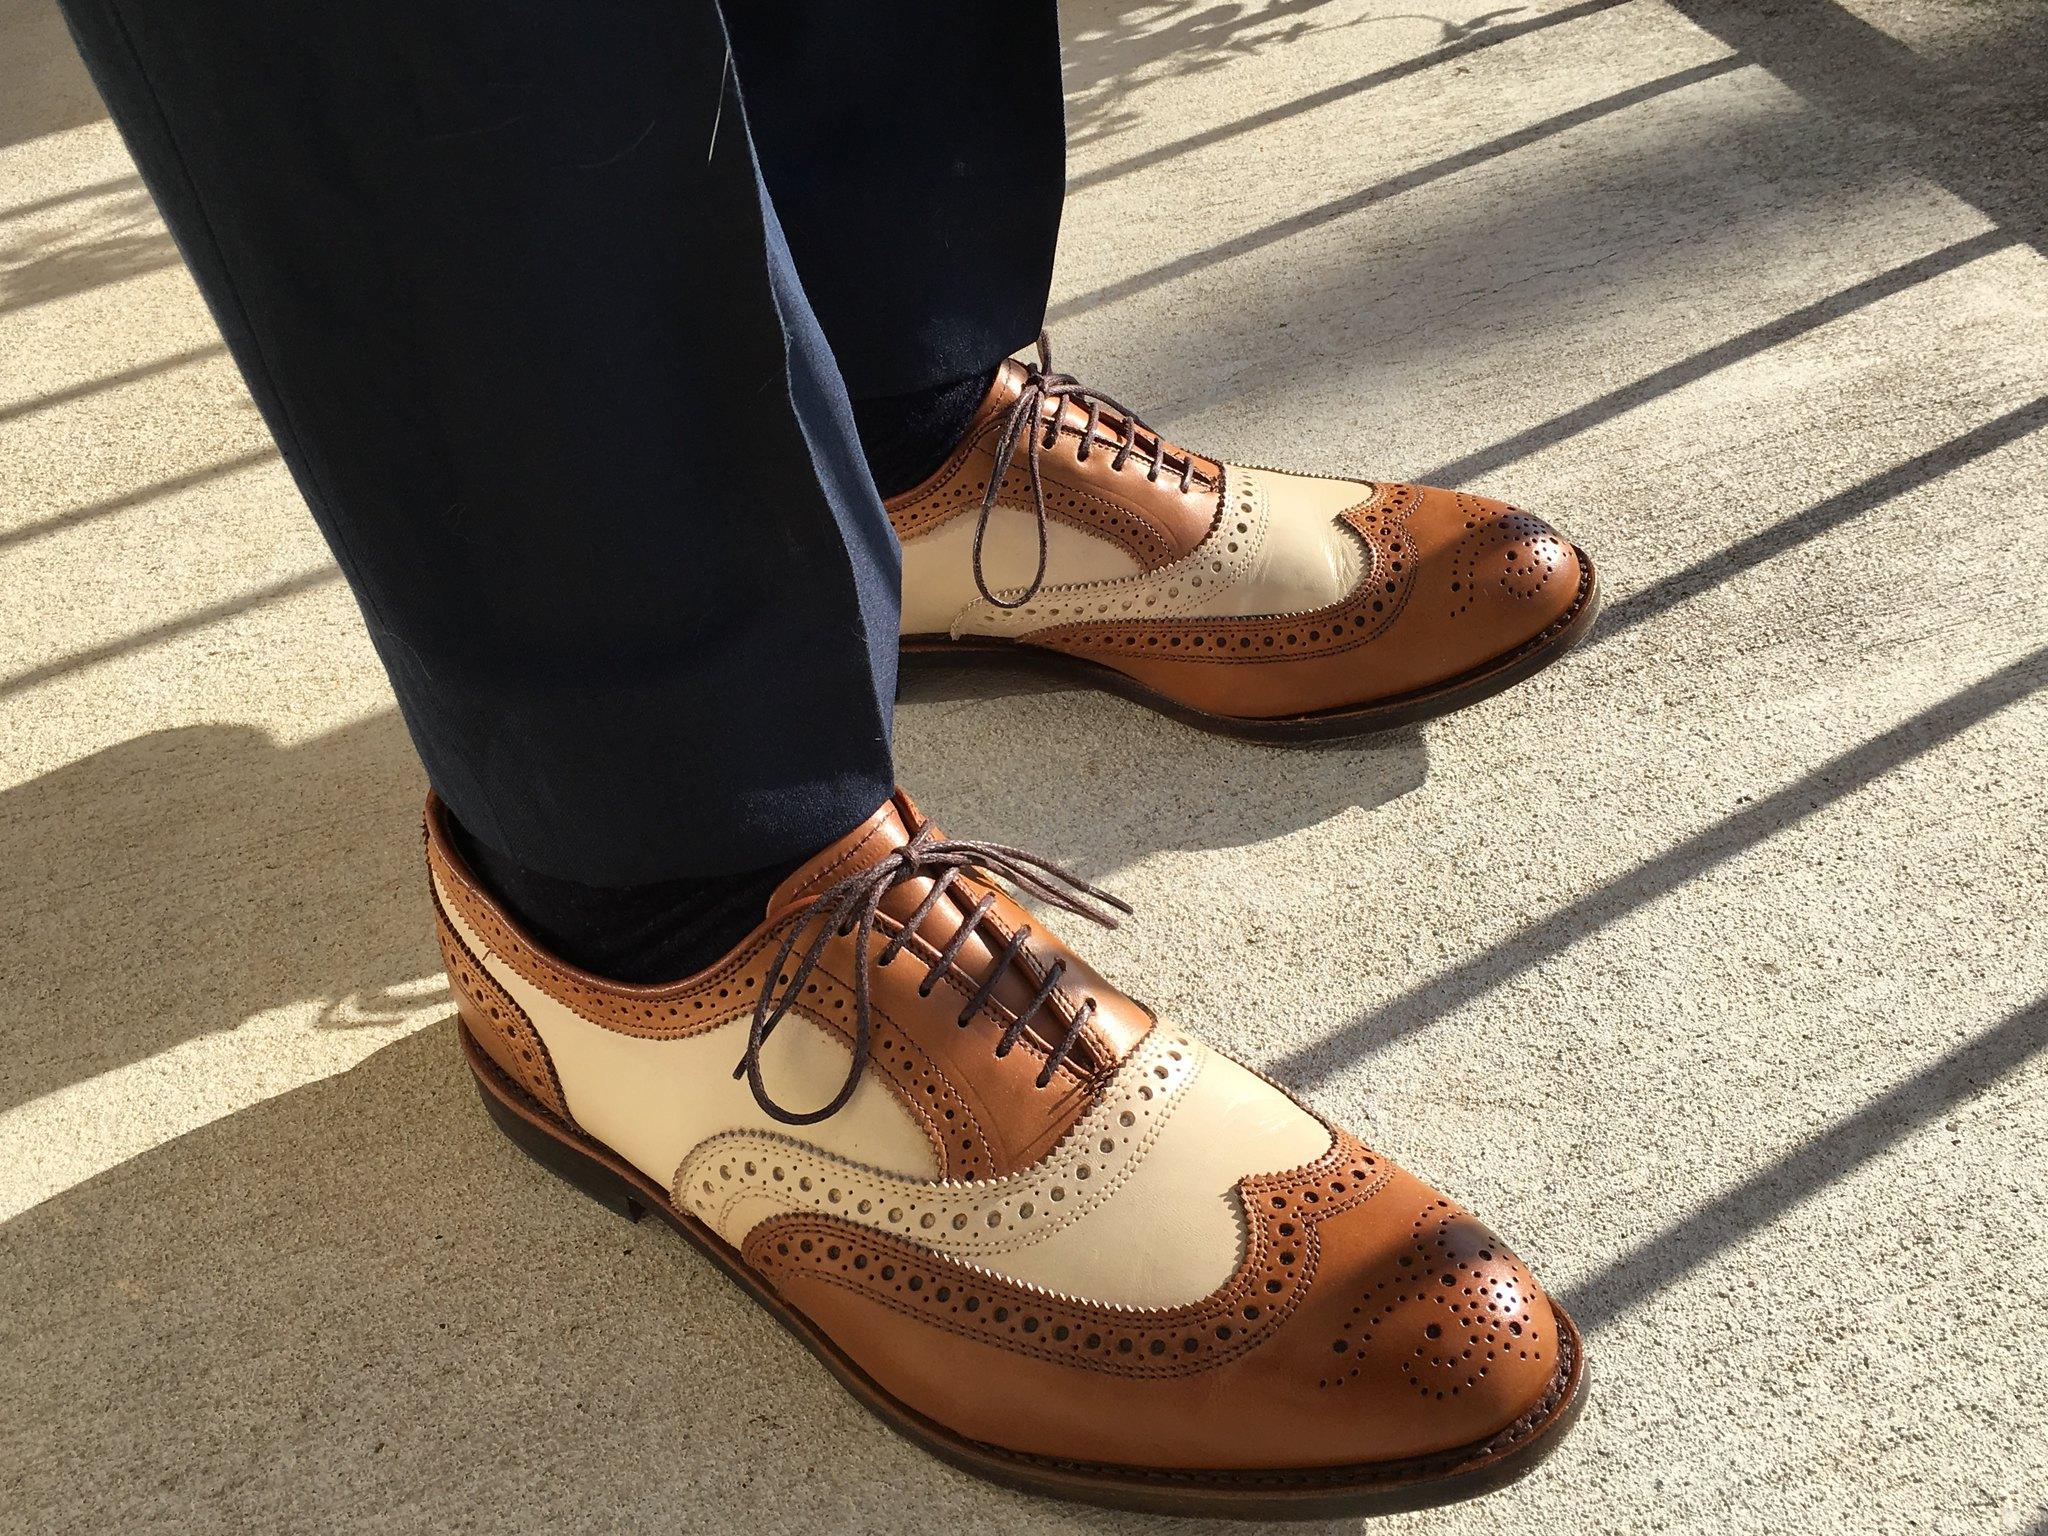 Rancourt Dress Shoes Review